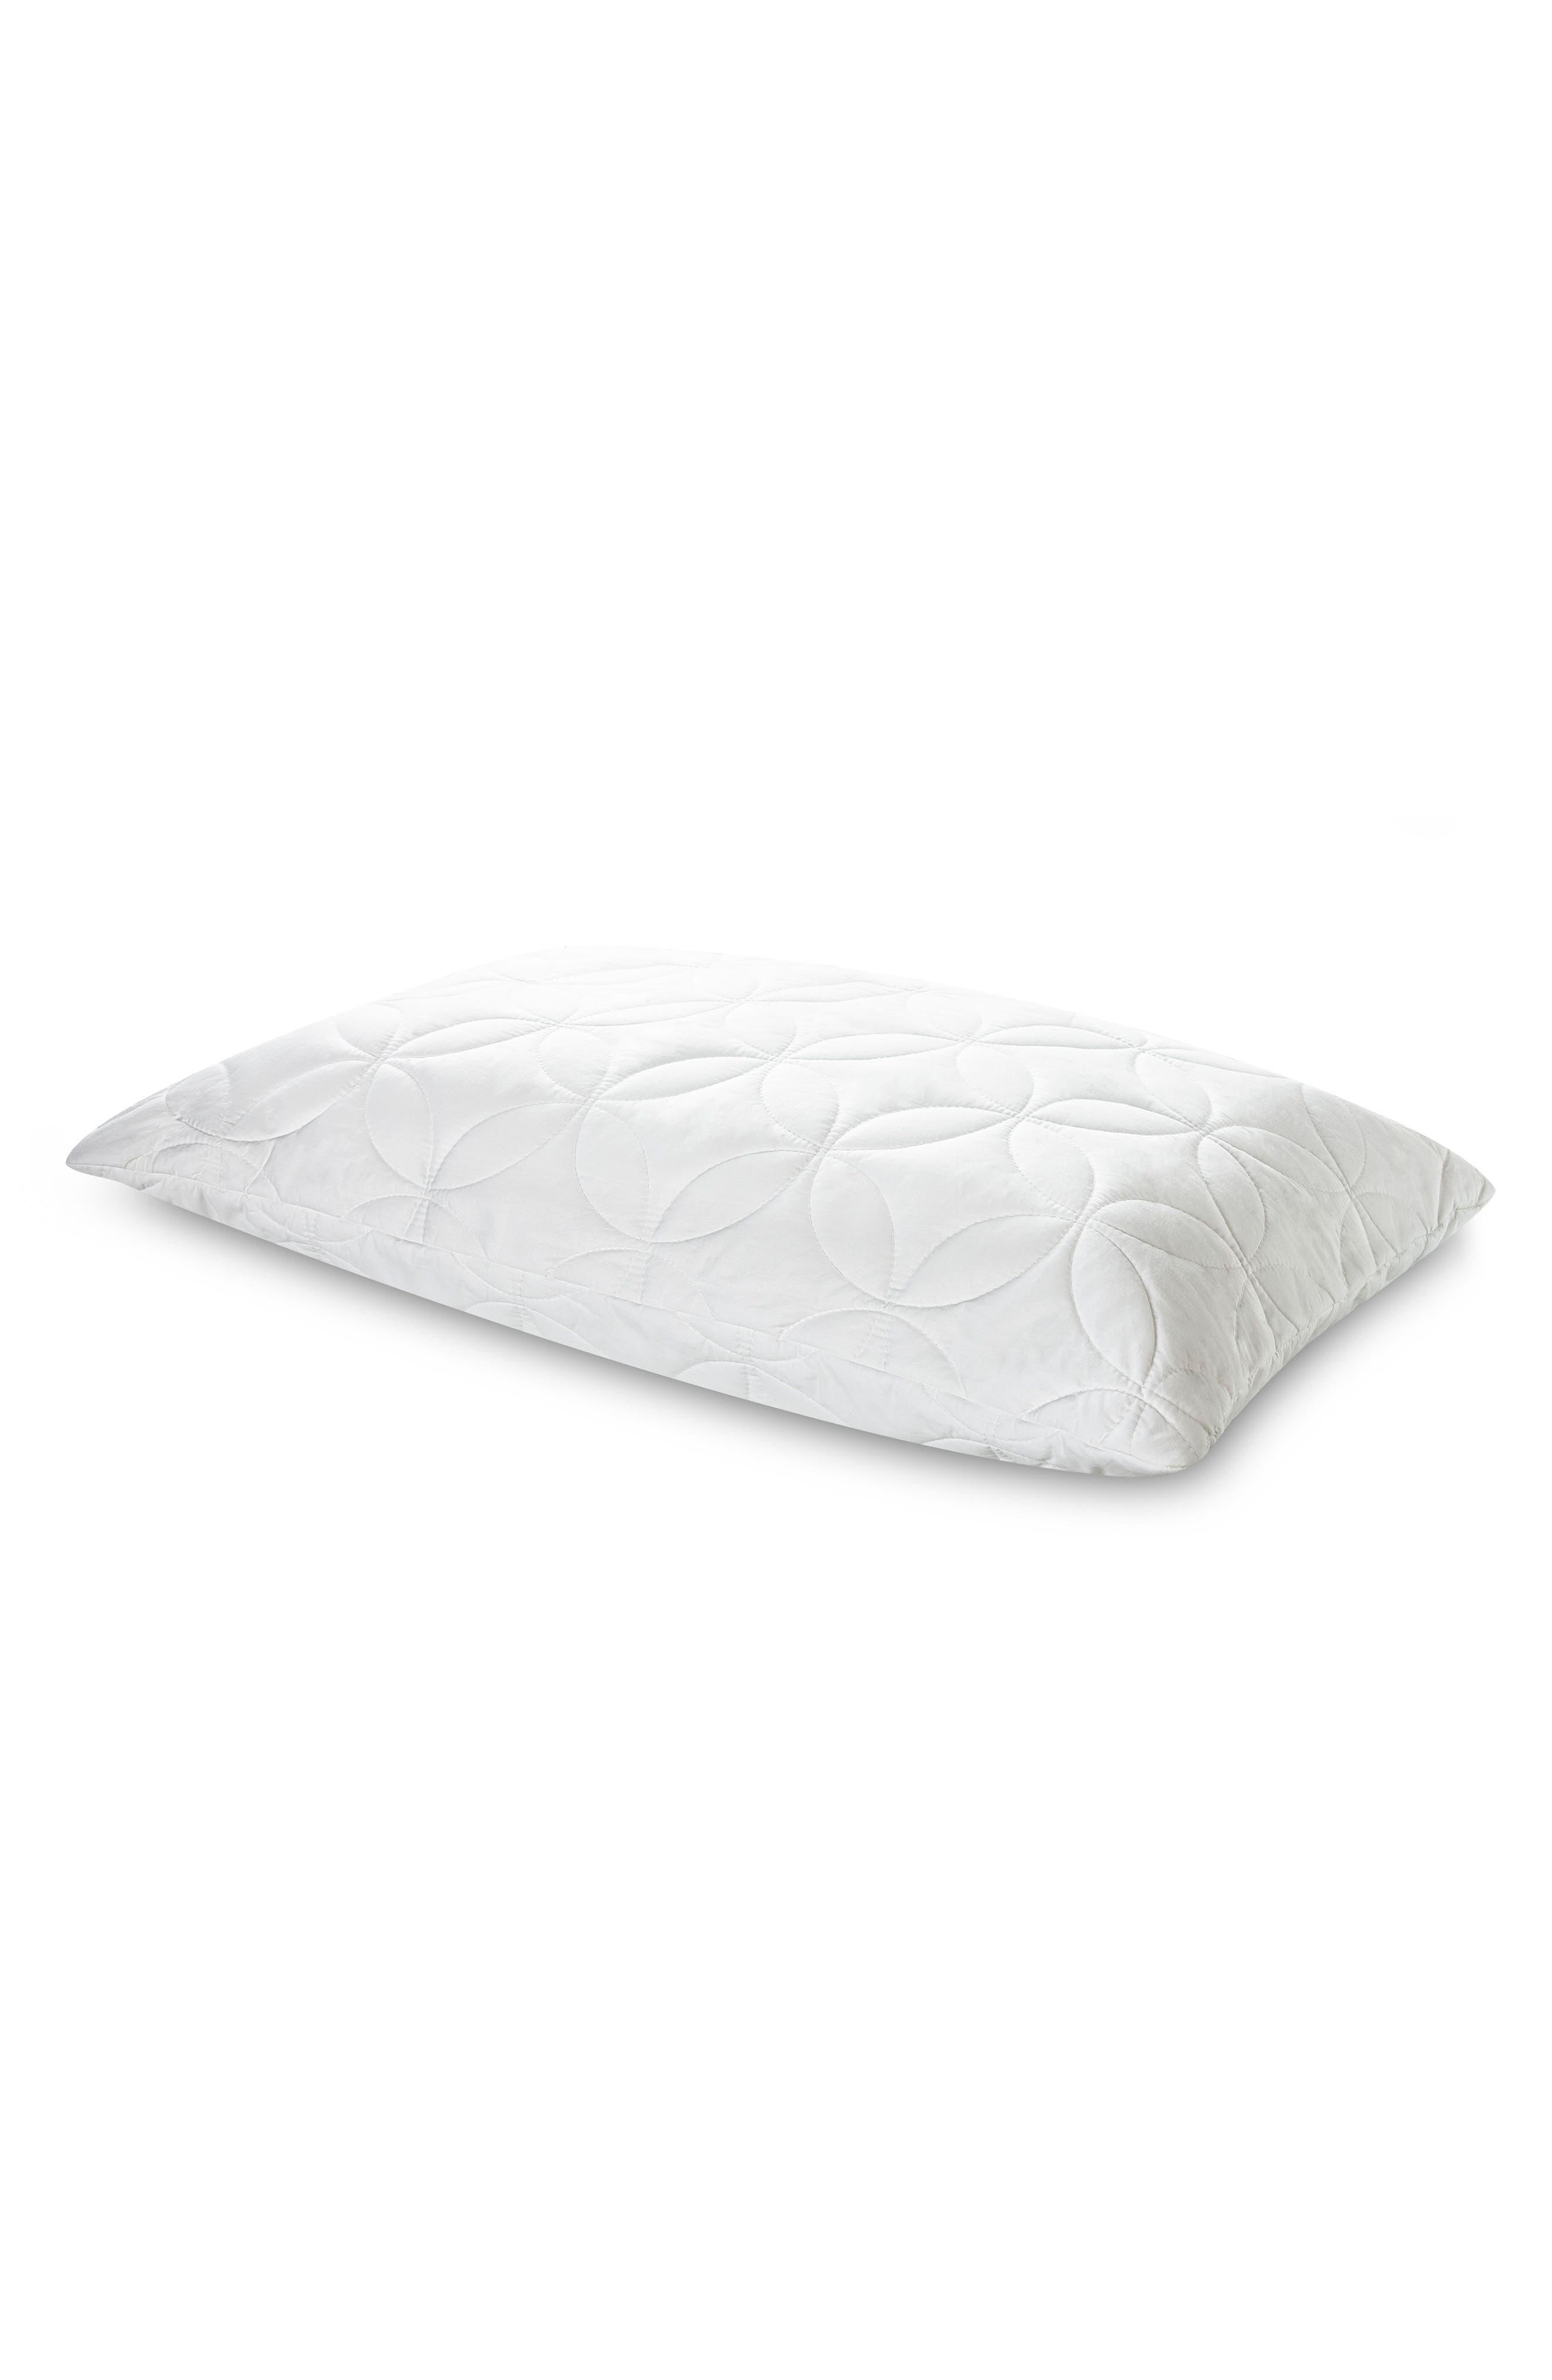 Tempur-Pedic TEMPUR-Cloud Soft & Conforming King Pillow